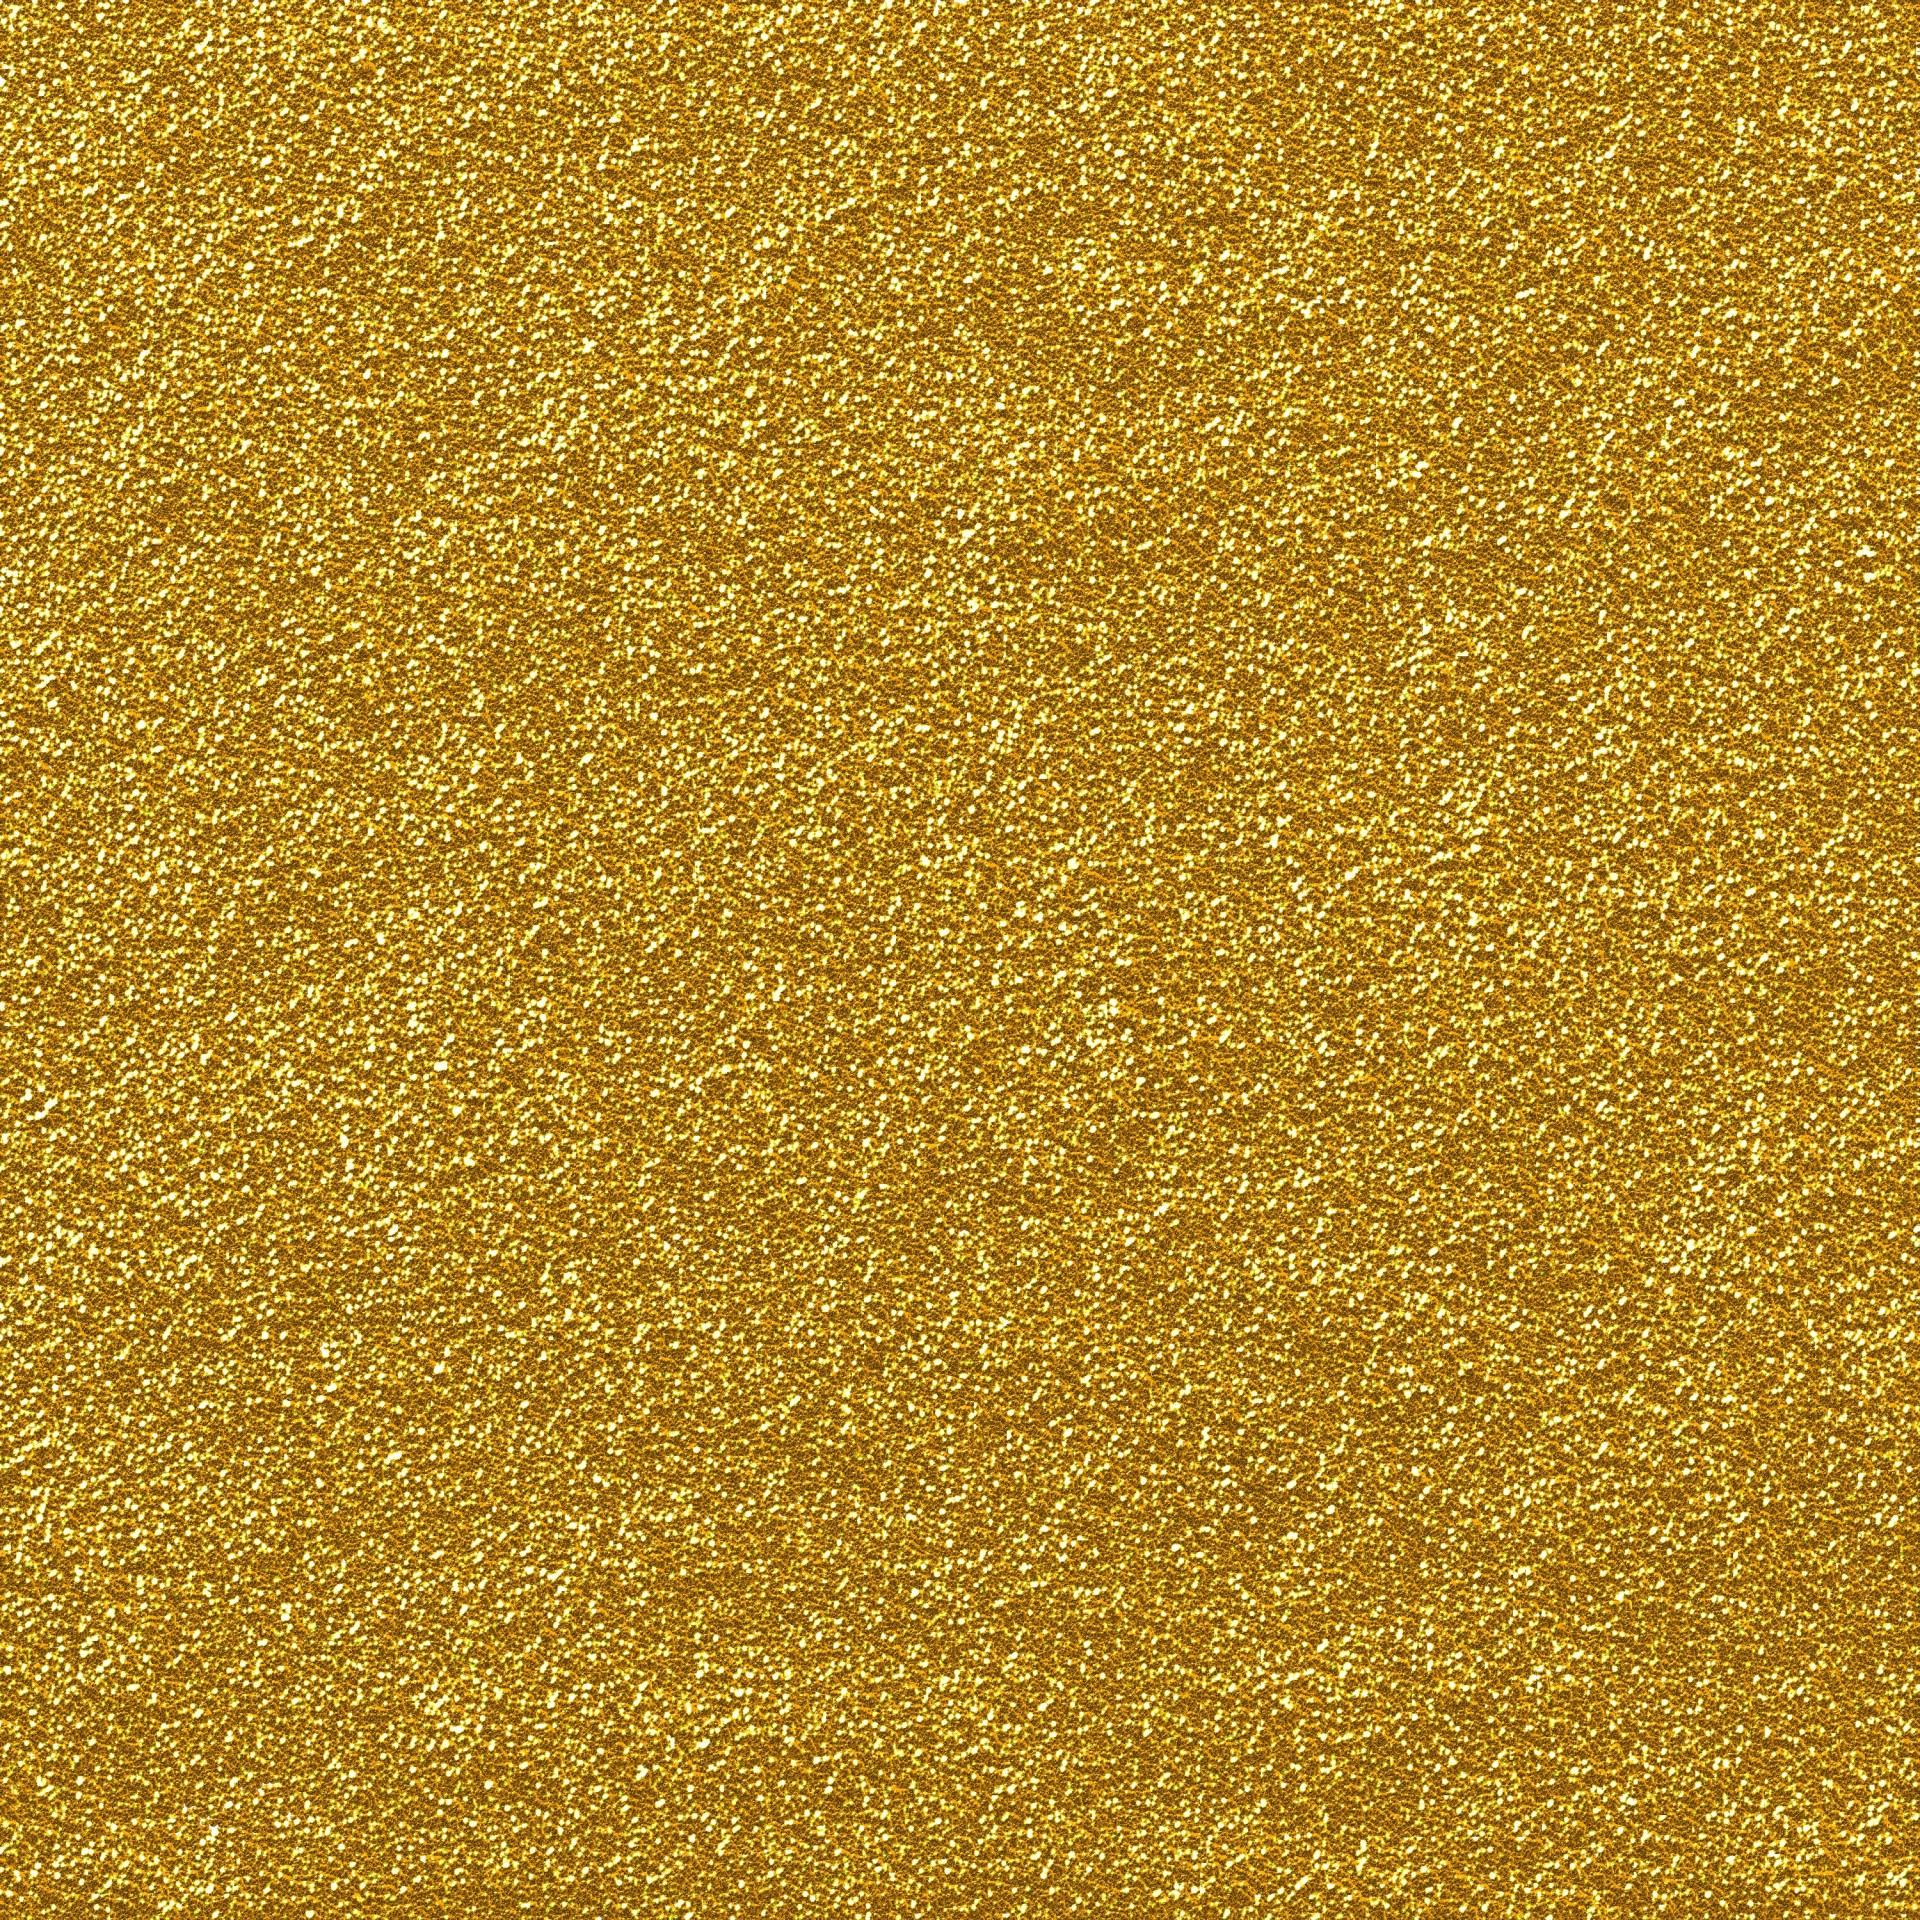 Metallic Gold Glitter Texture Stock Photo HD   Public Domain 1920x1920